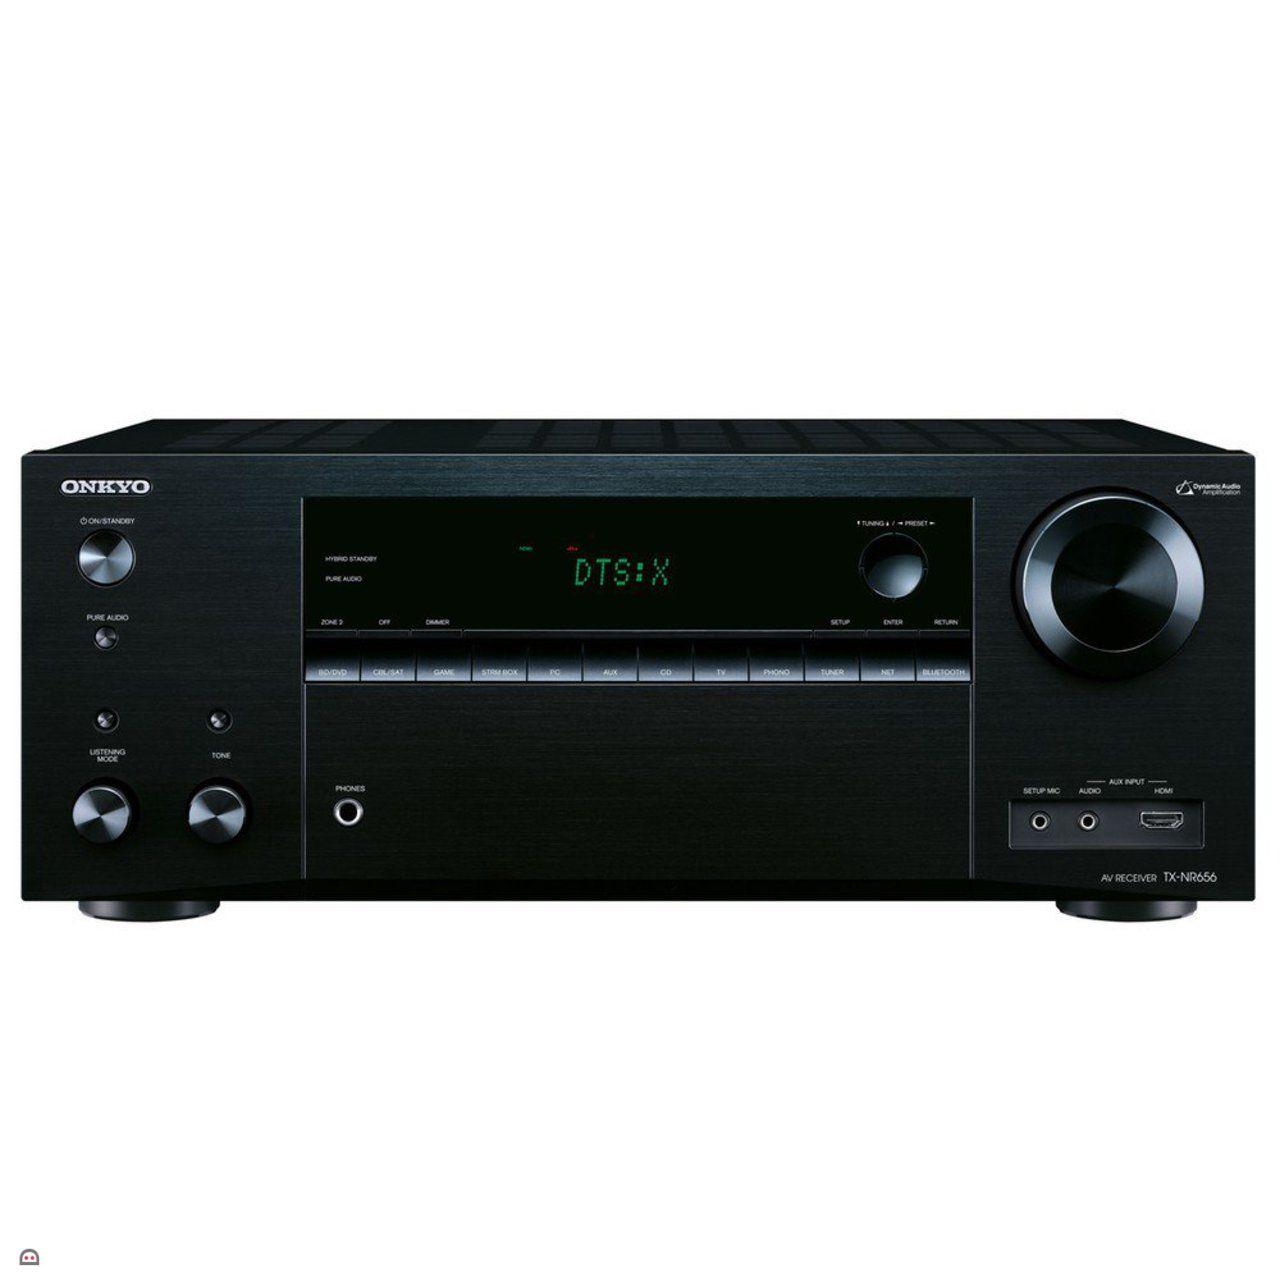 Ampli Home Cinéma 7.2 Onkyo TX-NR656 Noir - Dolby Atmos 5.2.2, HDMI 2.0a, HDCP 2.2, DTSX